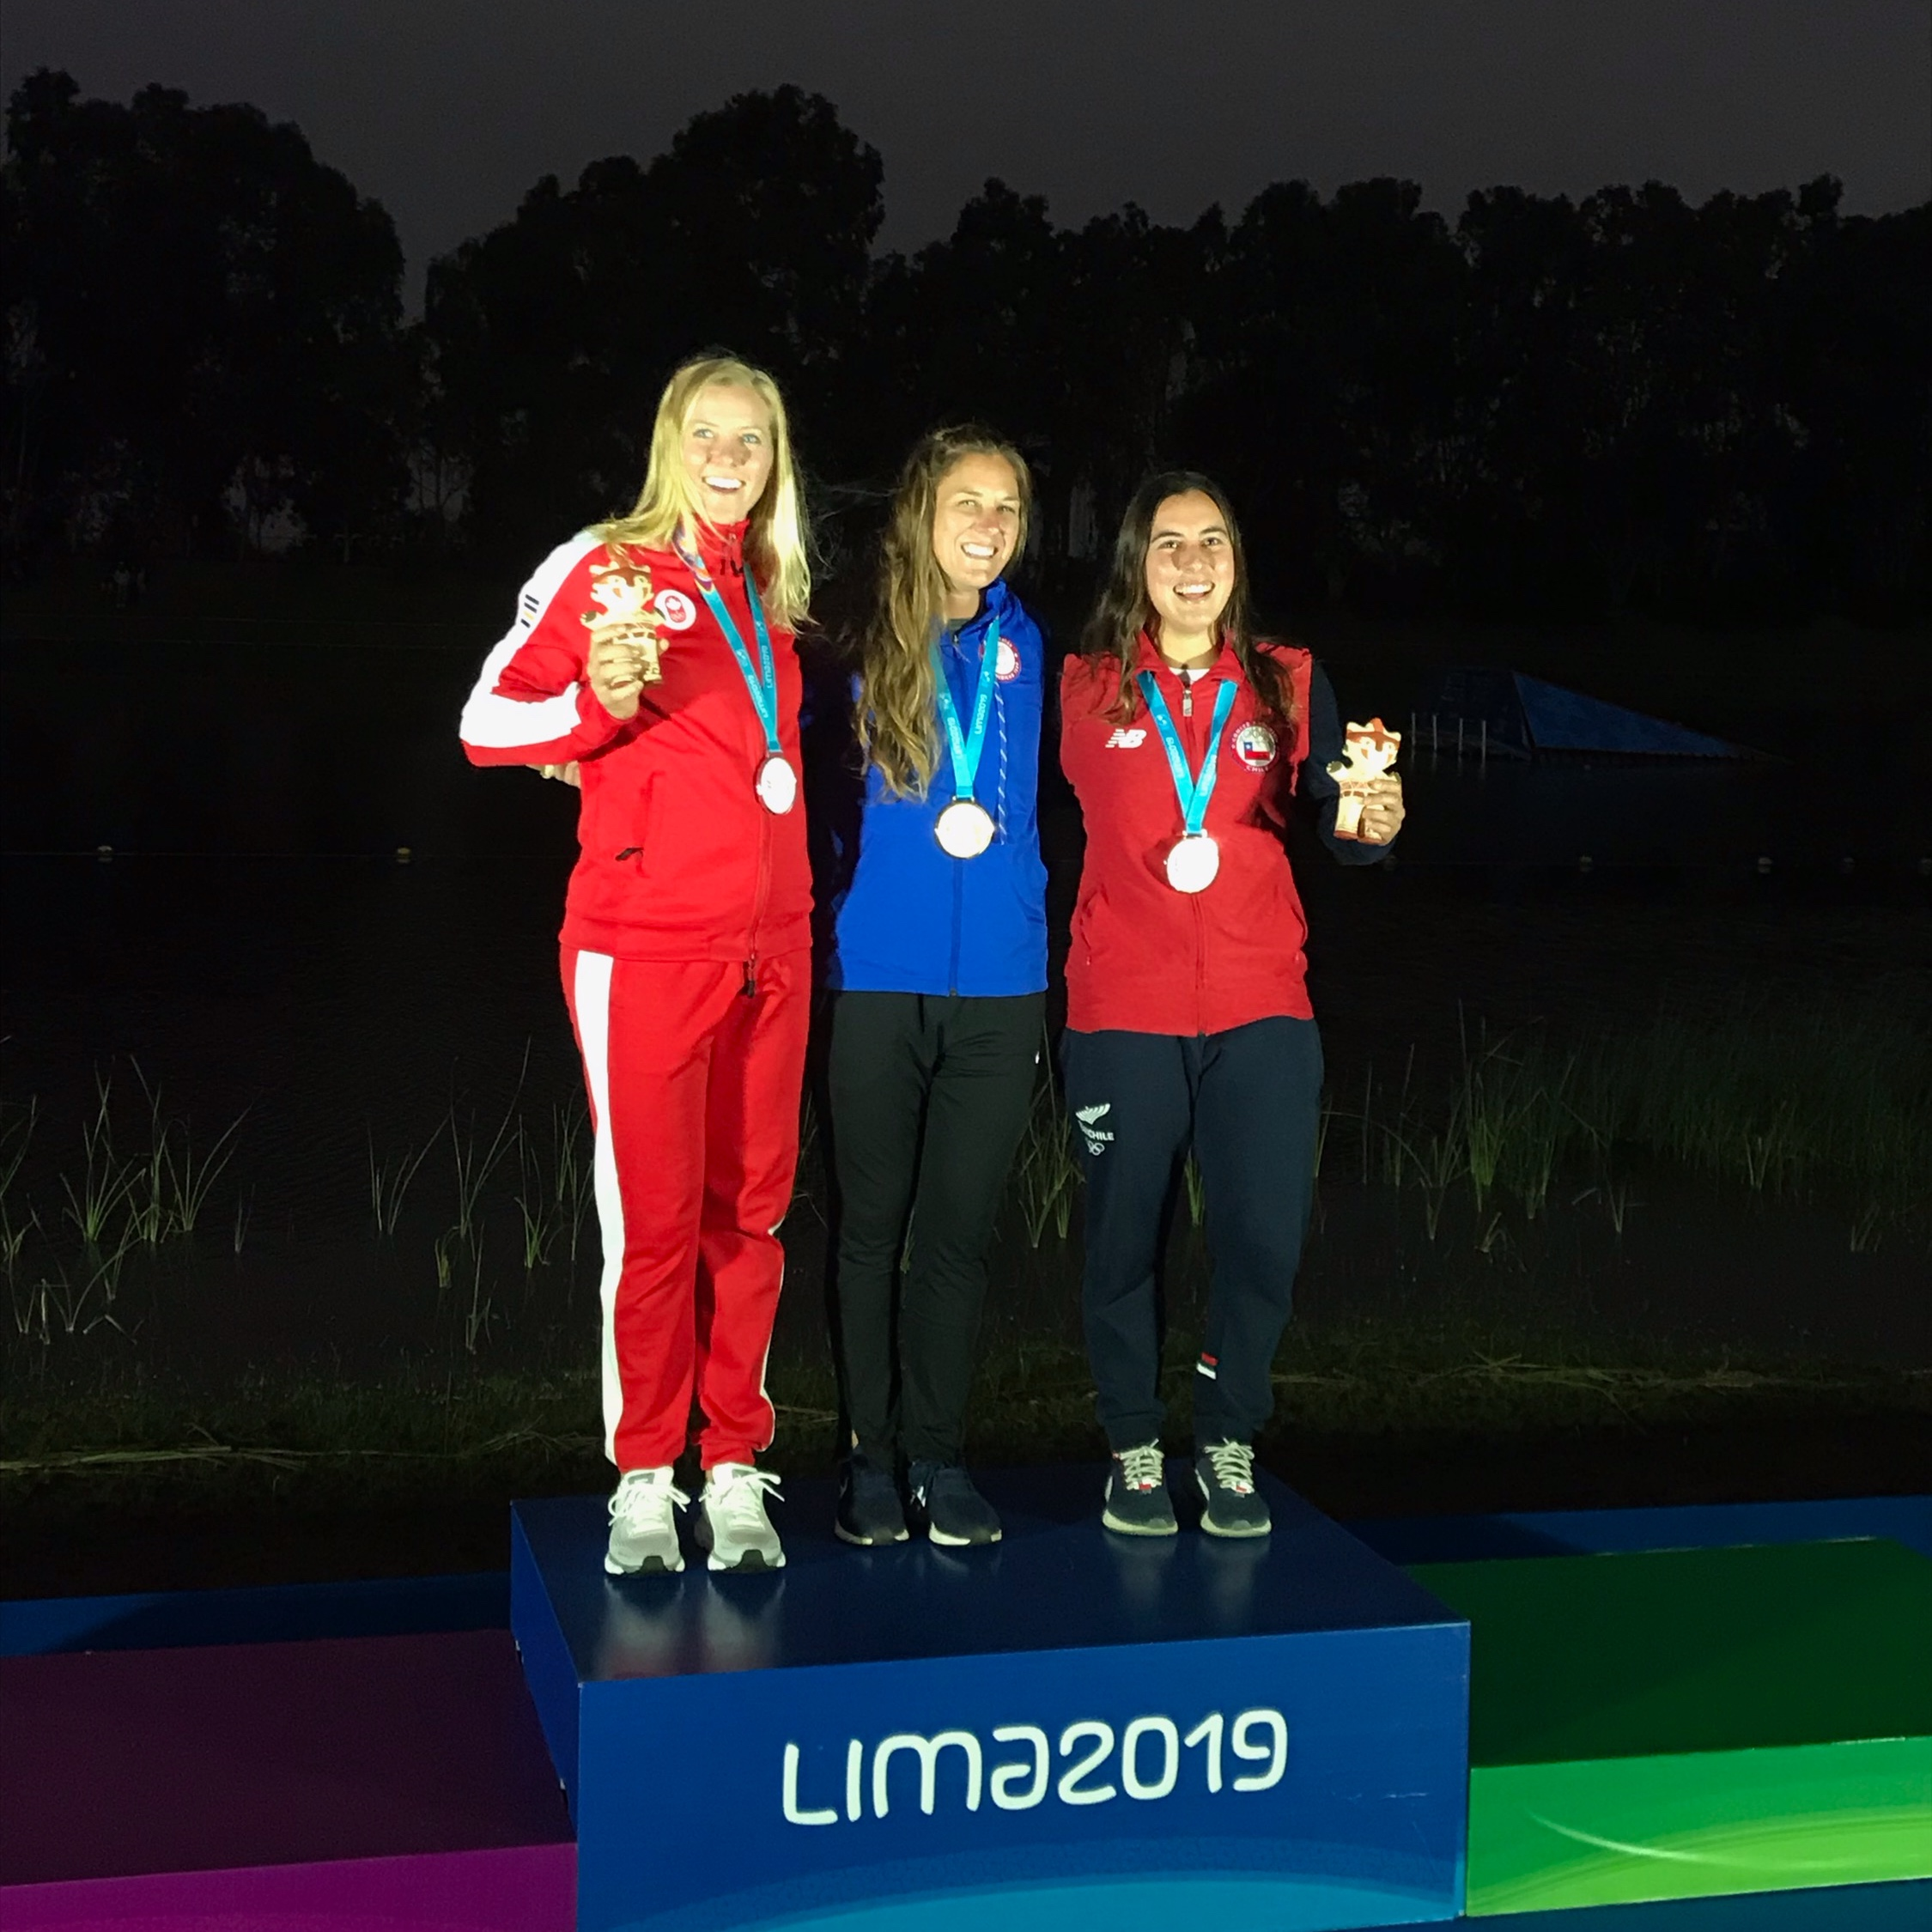 Jaquess, Garcia Win Gold At Pan Am Games - 7/29/2019U.S. Pan American Water Ski Team members Regina Jaquess (Santa Rosa Beach, Fla.) and Taylor Garcia (Winter Garden, Fla.) won gold medals and teammates Mary Morgan Howell (Dothan, Ala.), Erika Lang (Gilbert, Ariz.) and Adam Pickos (Santa Rosa Beach, Fla.) each earned medals on Monday at the XVIII Pan American Games at Laguna Bujama in Lima, Peru. Jaquess won gold medals in women's slalom and jumping, while Garcia won gold in men's jumping.